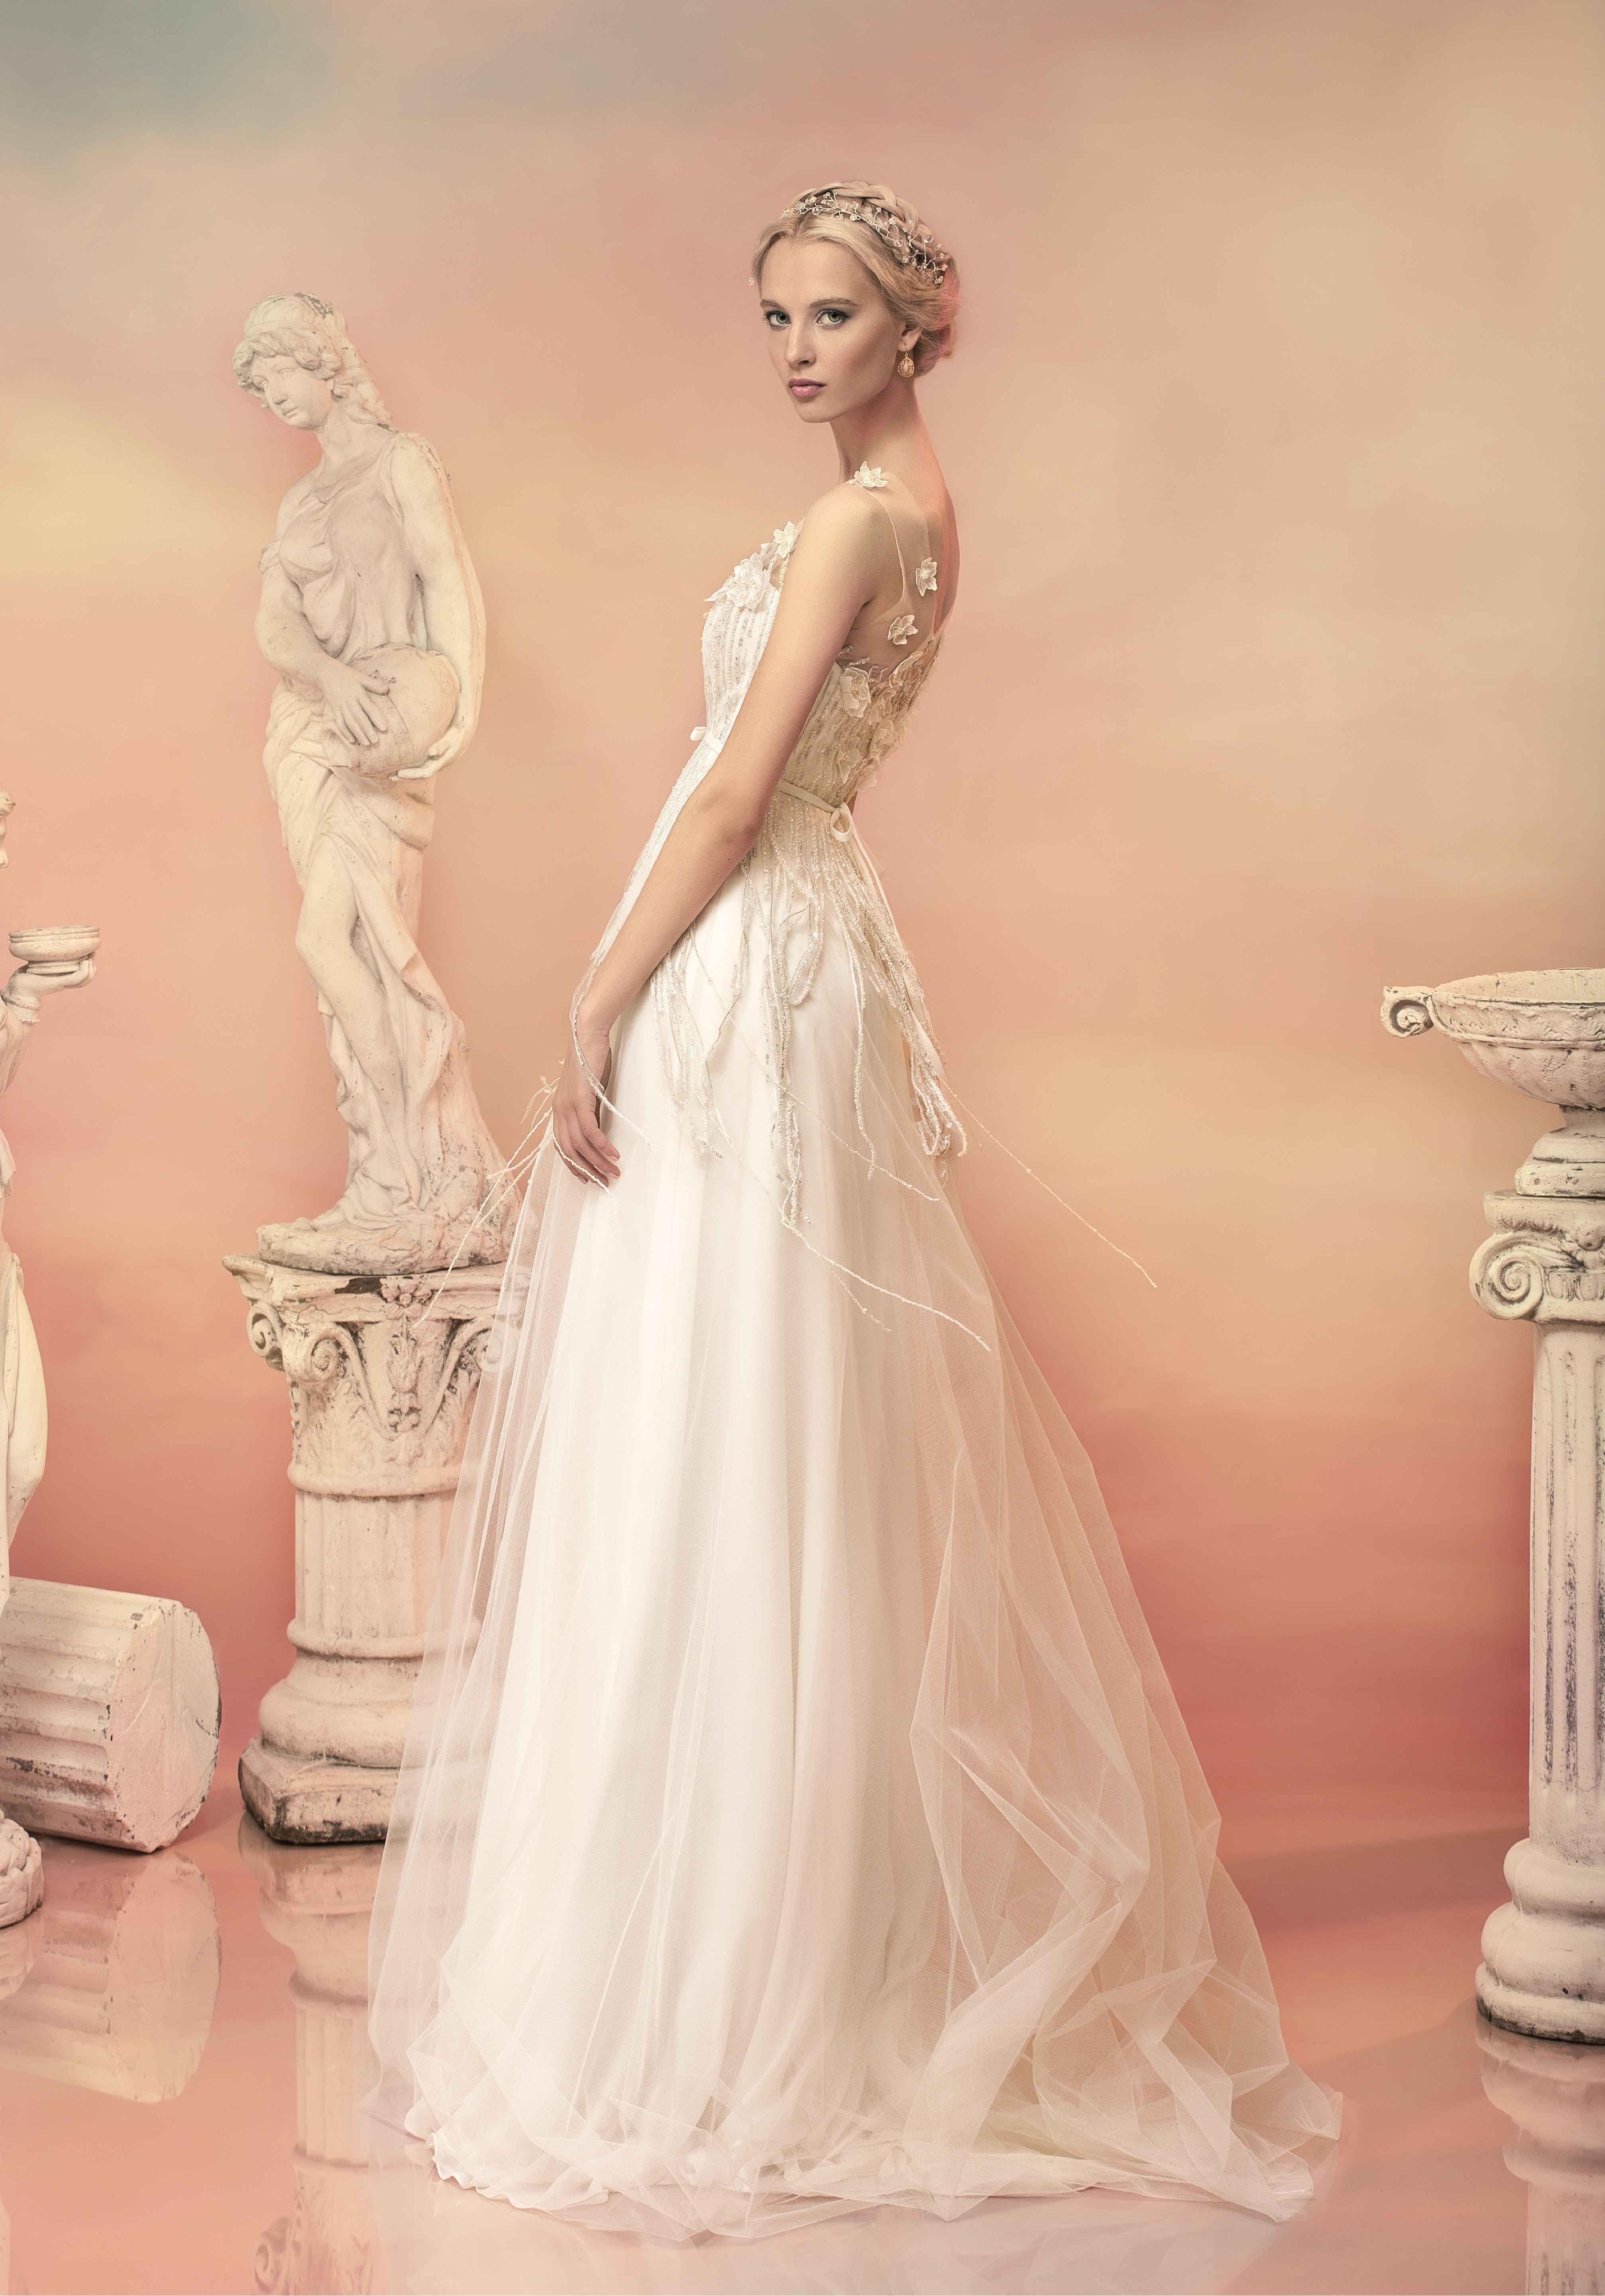 Wedding dresses in Empire style. Beauty and femininity